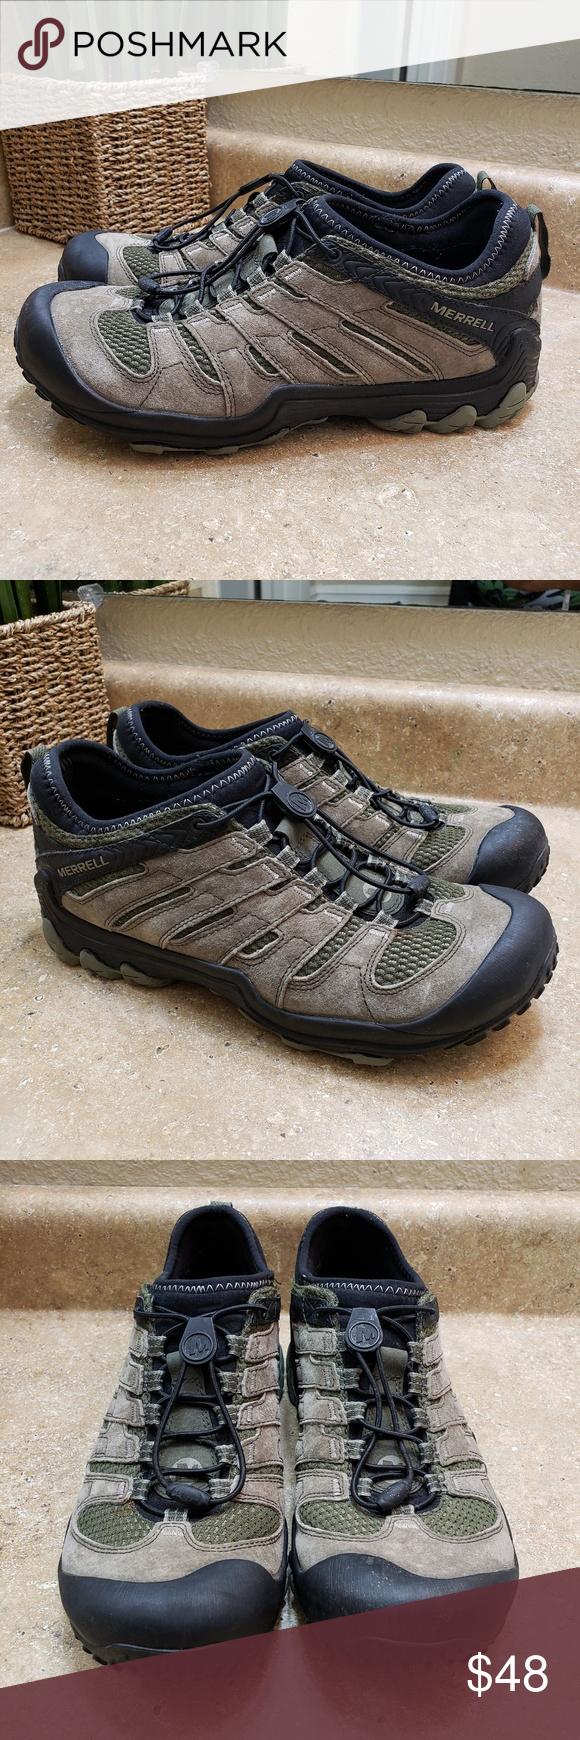 0b6874fe7ac Merrell Chameleon 7 Limit Stretch Hiking Shoes 10 Merrell Chameleon 7 Limit  Stretch Hiking shoes.